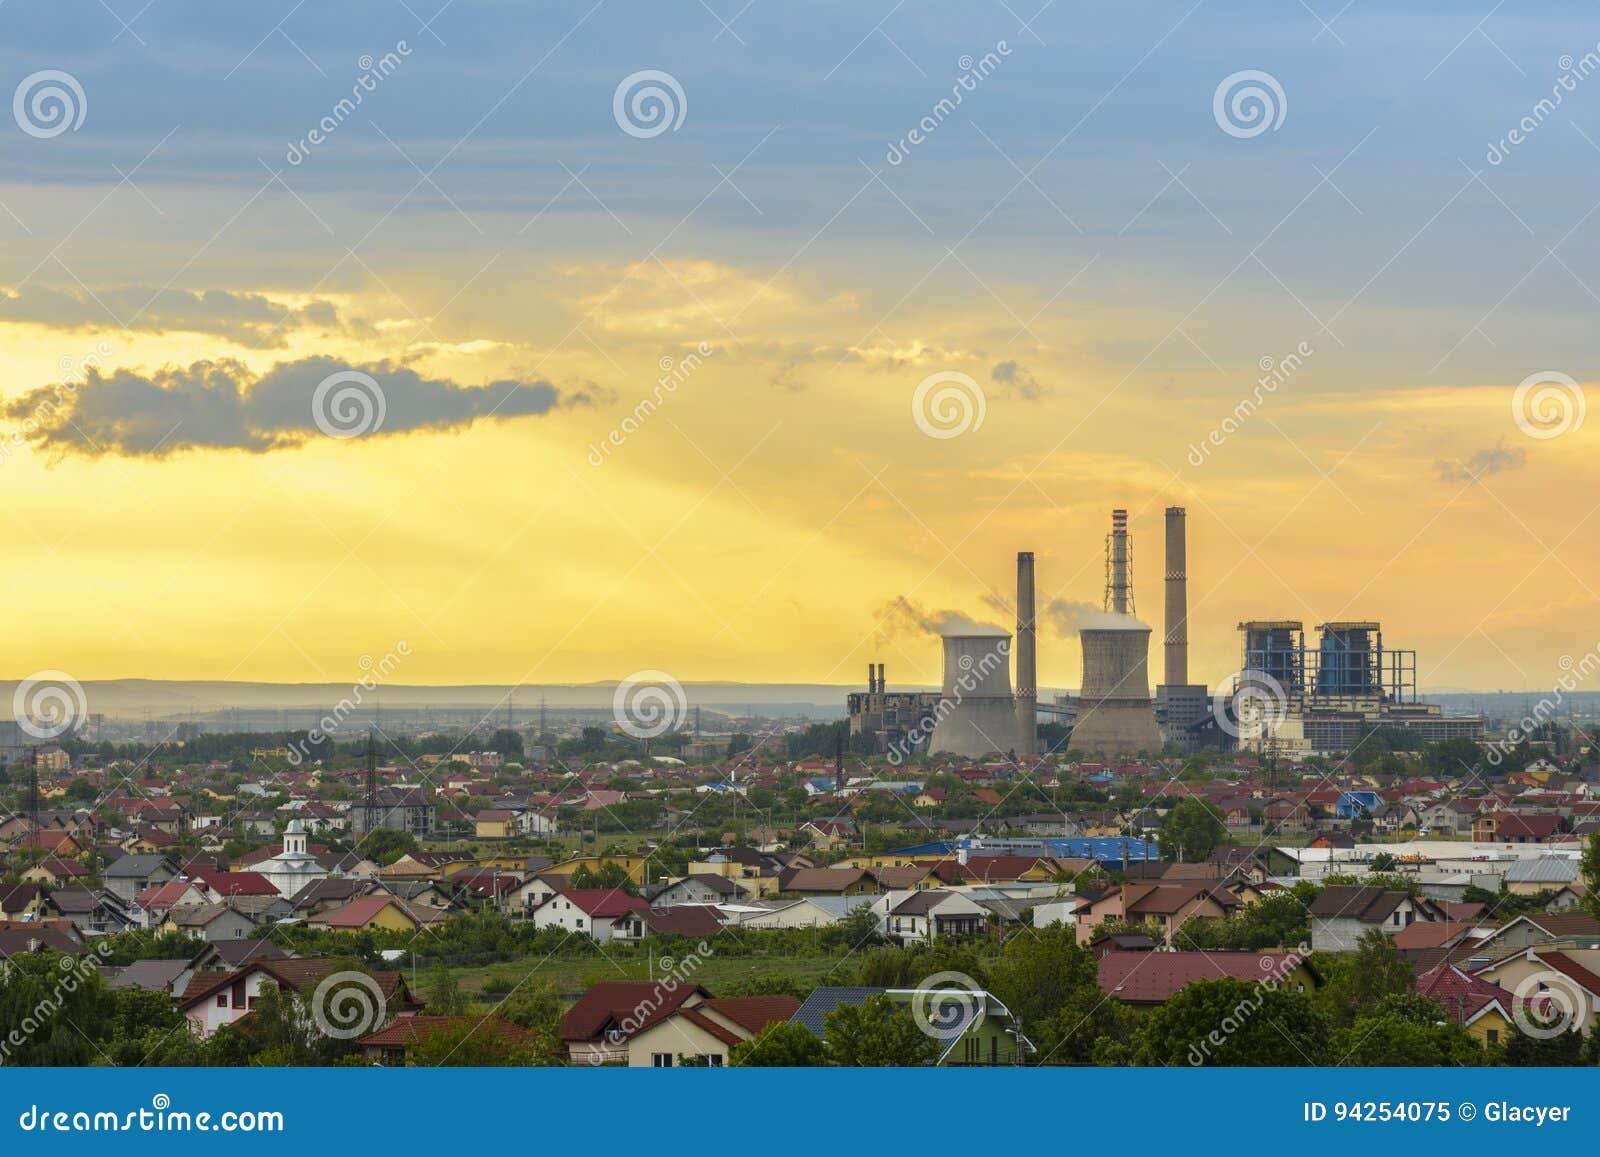 Storm clouds above Craiova city